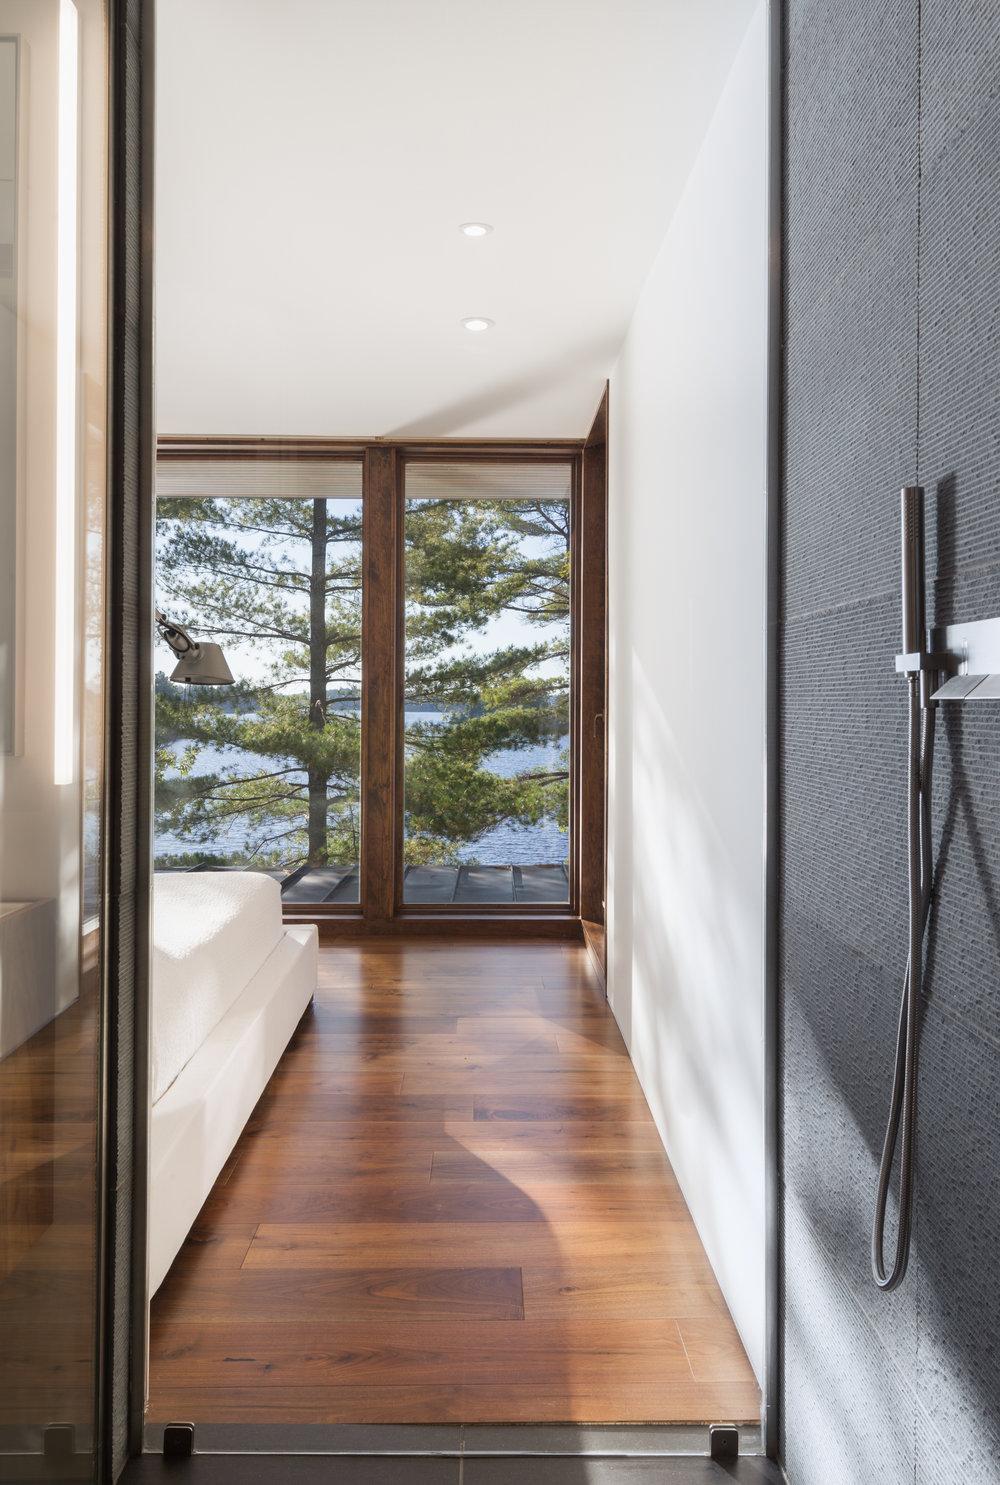 turkel_design_modern_prefab_home_bedroom_view.jpg